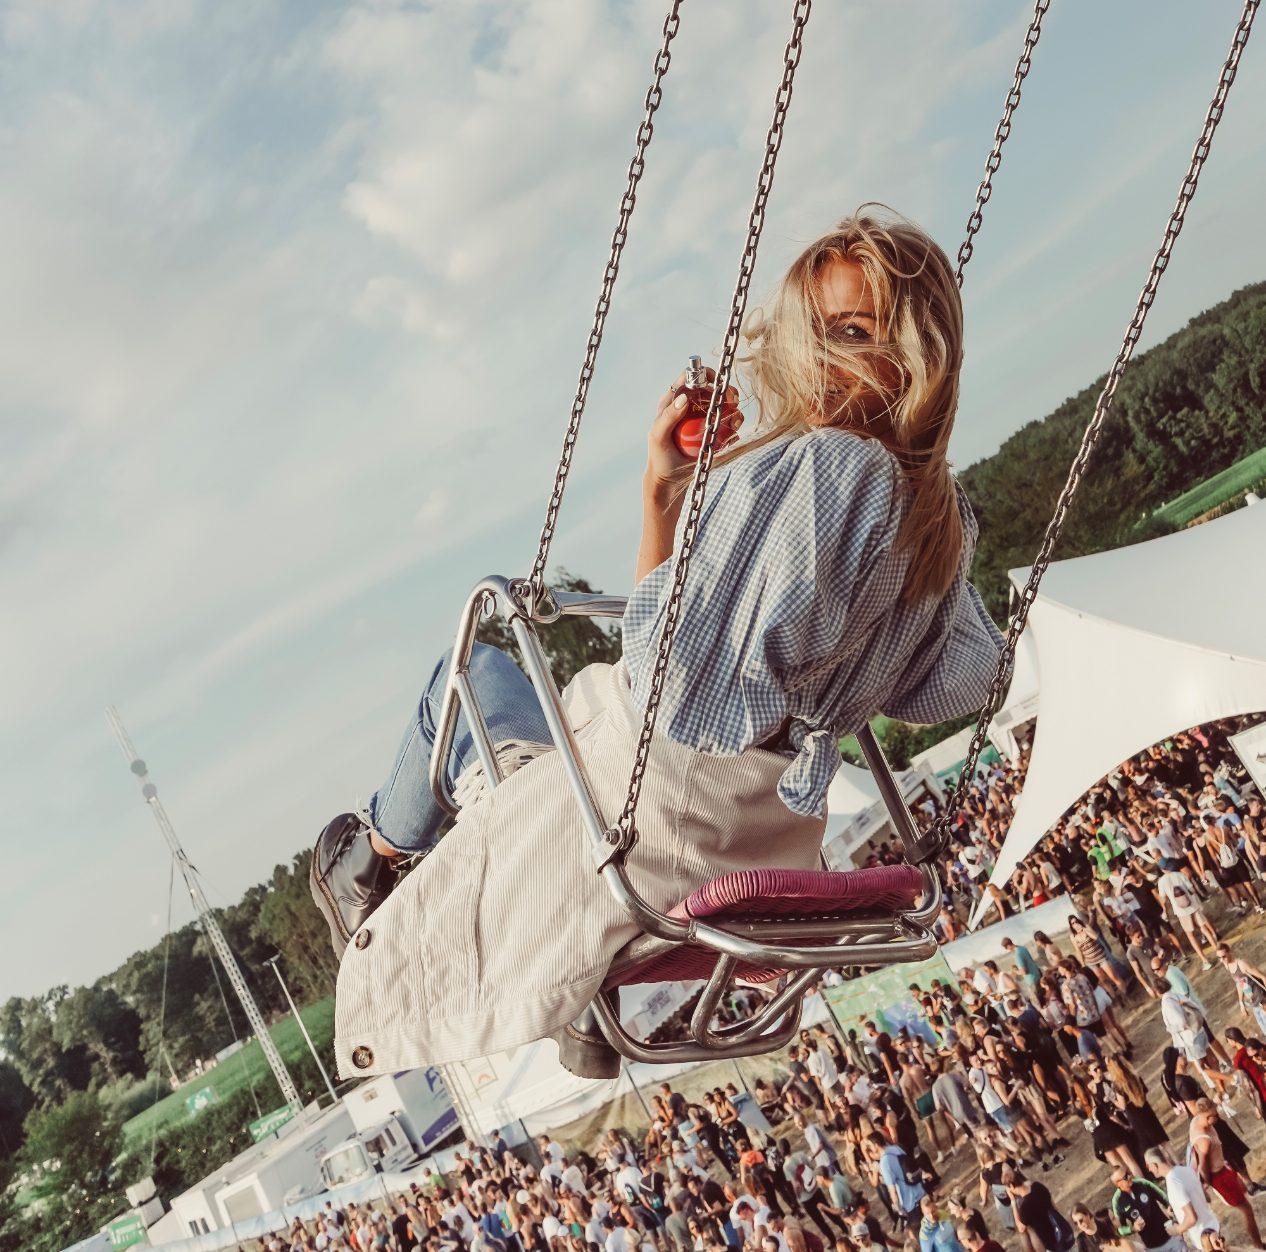 Duftpromotion auf Festivals